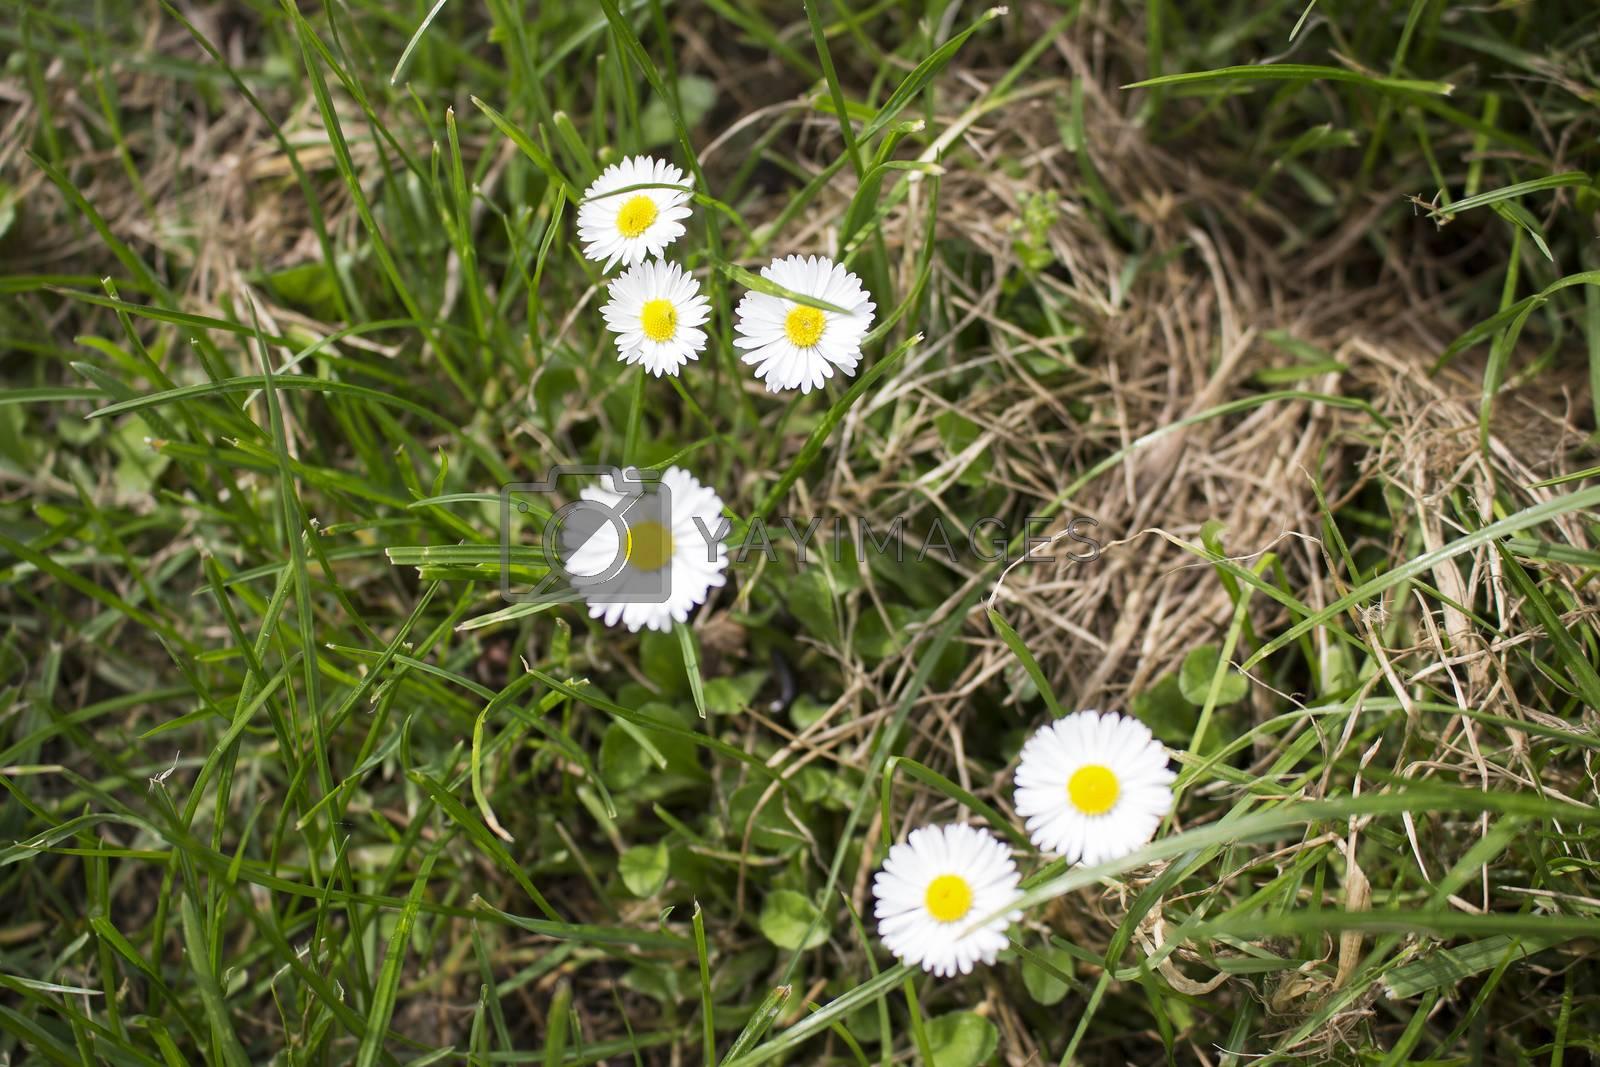 Daisy macro: bellis perennis on grass background